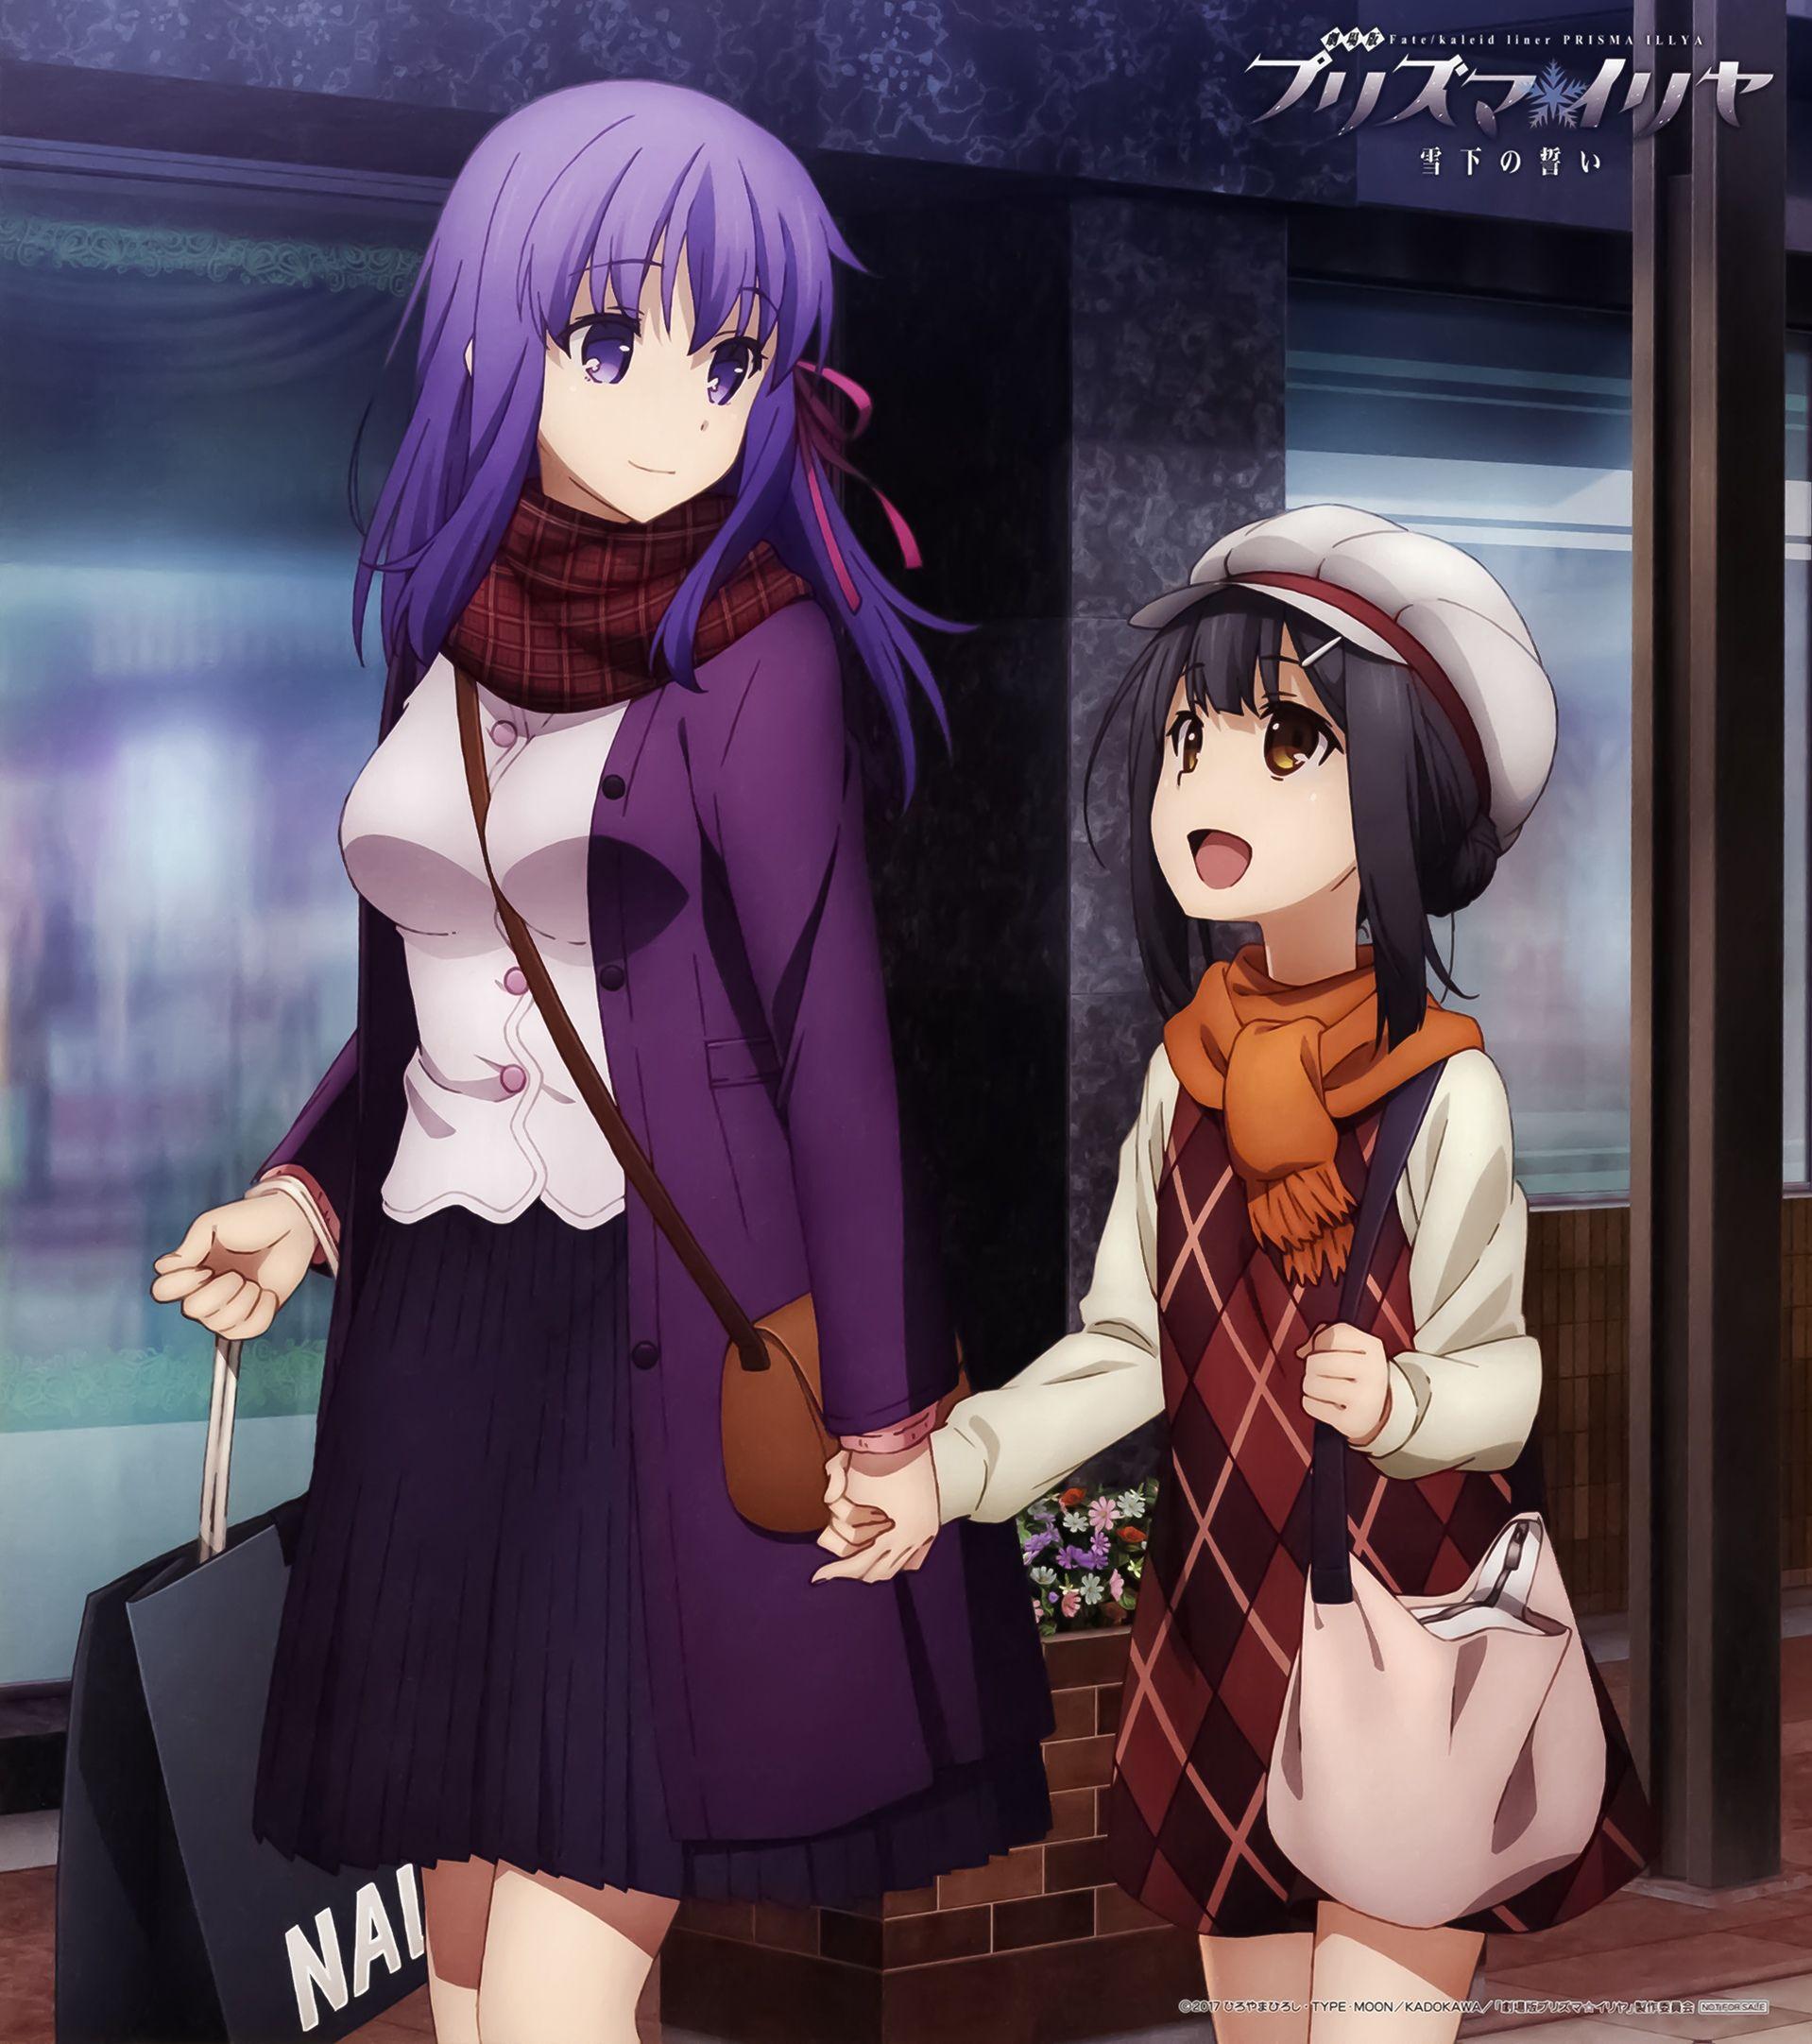 Matou Sakura Miyu Edelfelt Fate Anime Series Fate Fate Stay Night